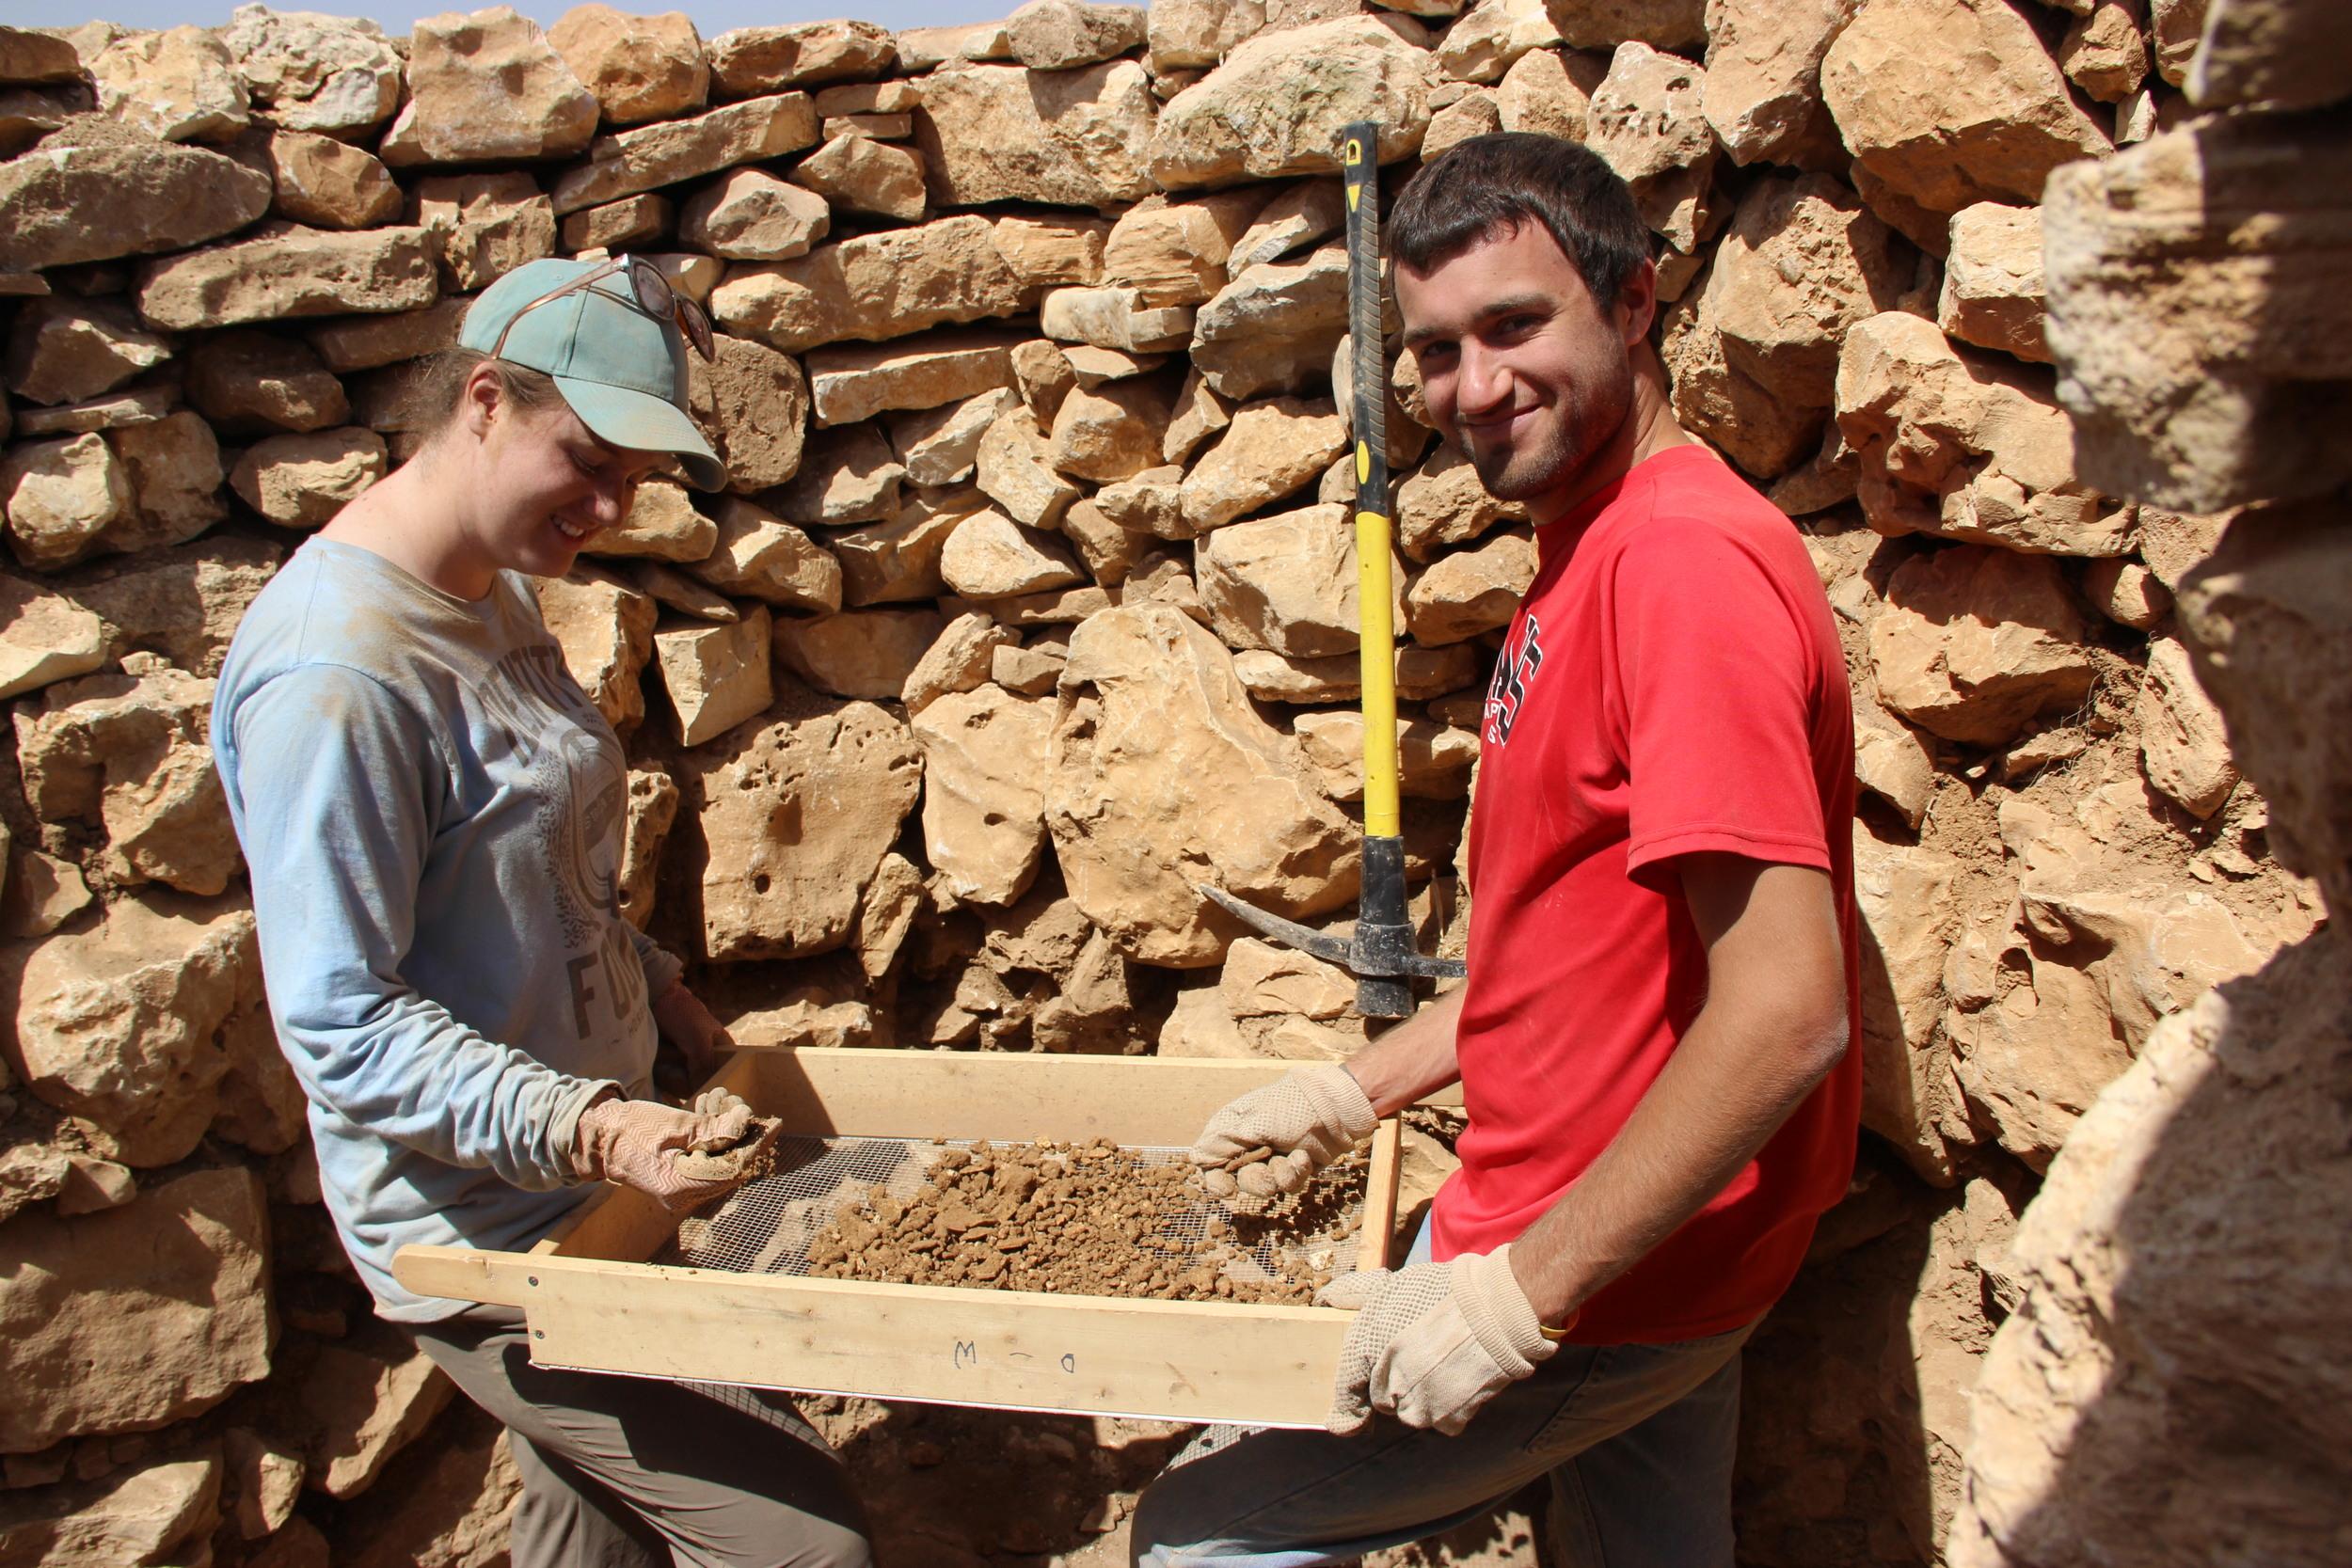 Lee University students sift through sand and dirt at Khirbet el-Maqatir.